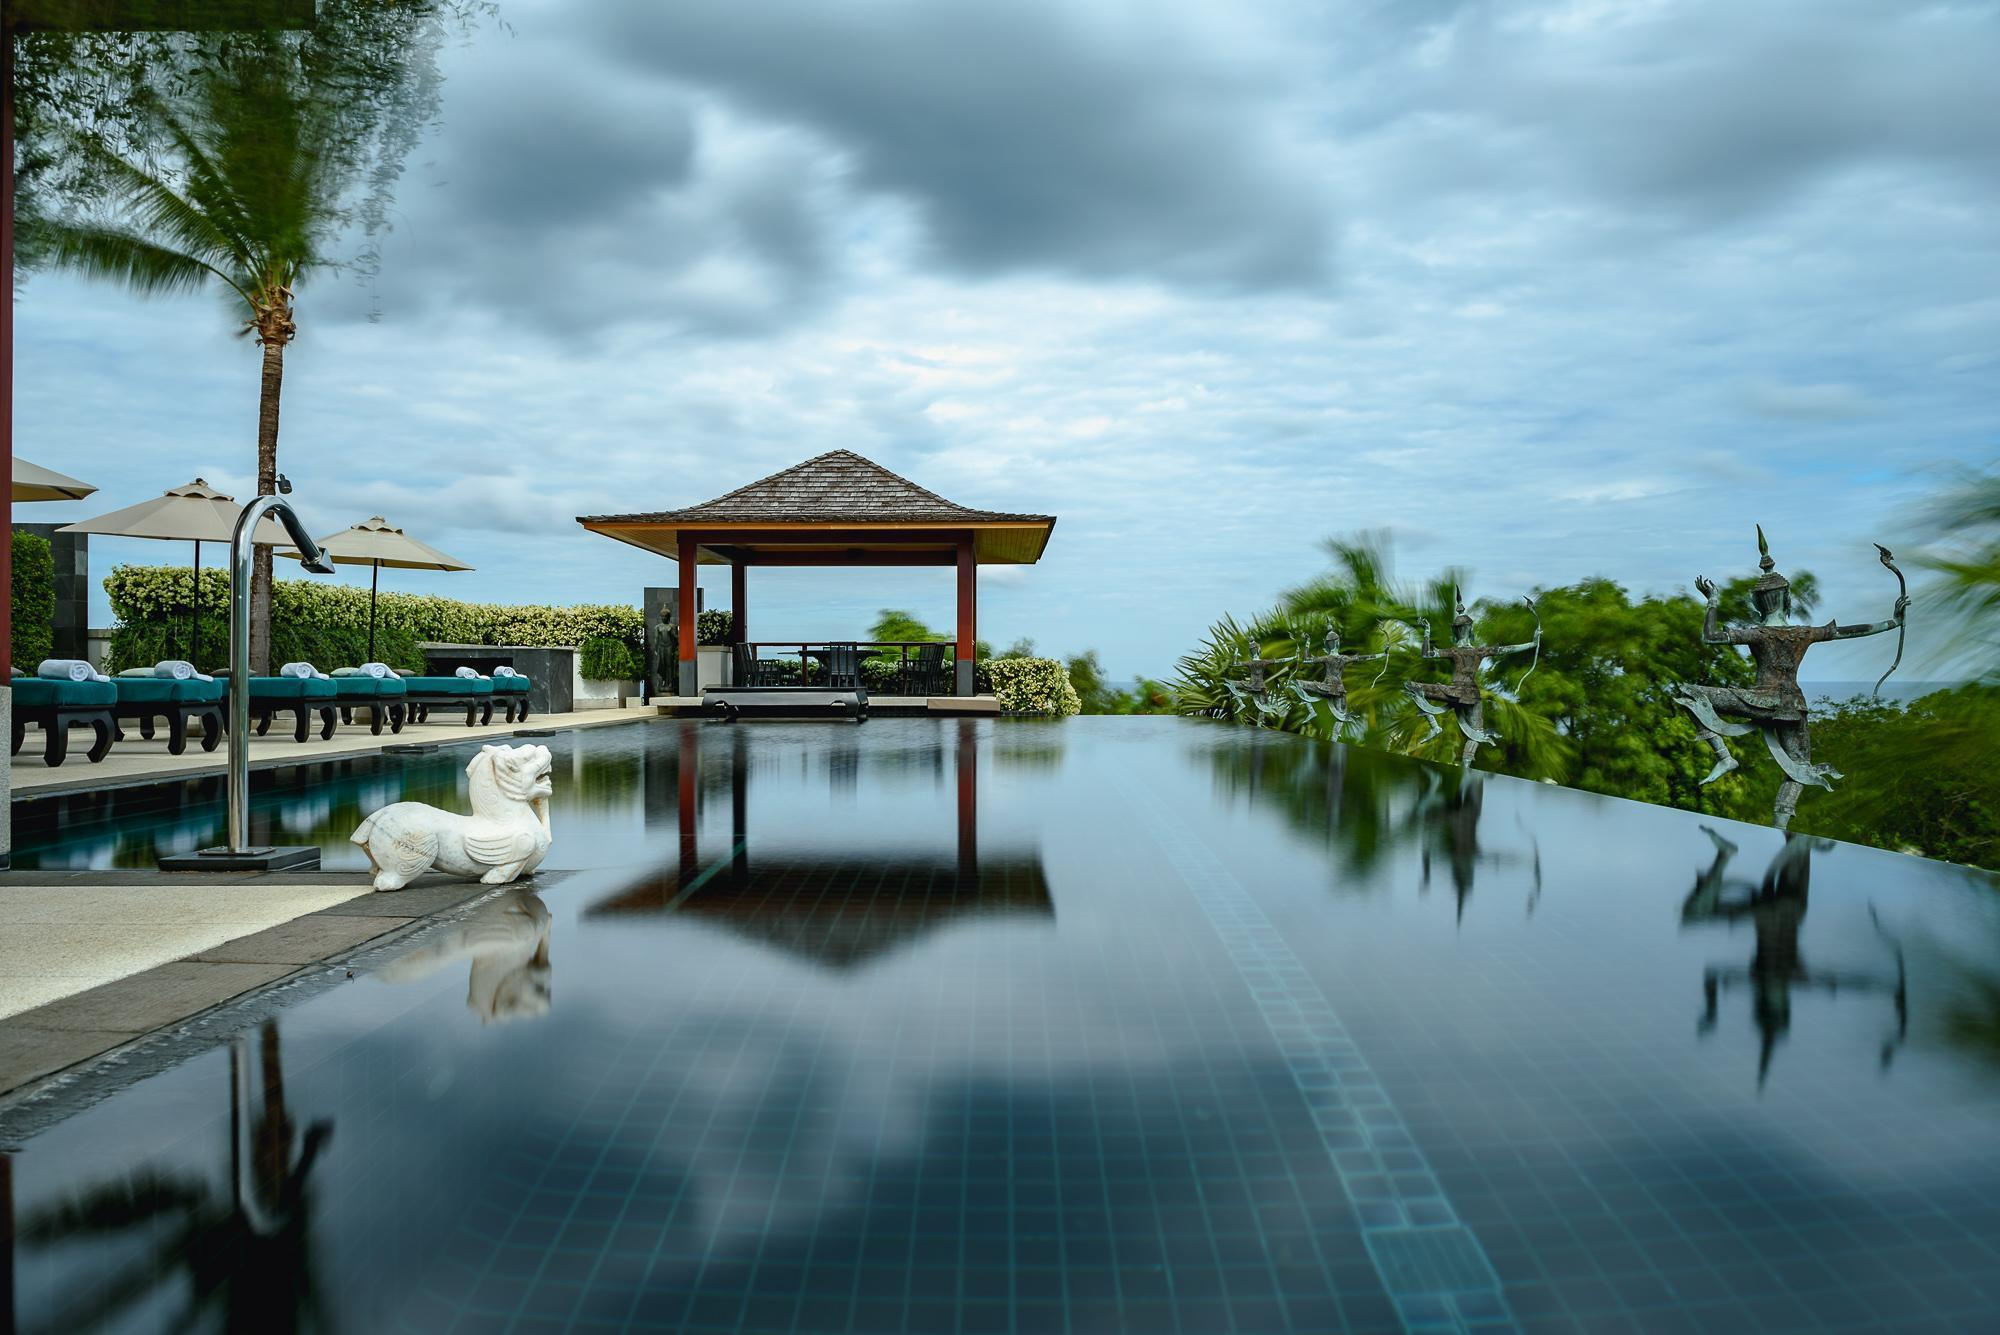 ⭐Star View Villa 7BR w/ Infinity Pool Near Beach วิลลา 7 ห้องนอน 7 ห้องน้ำส่วนตัว ขนาด 1160 ตร.ม. – กมลา